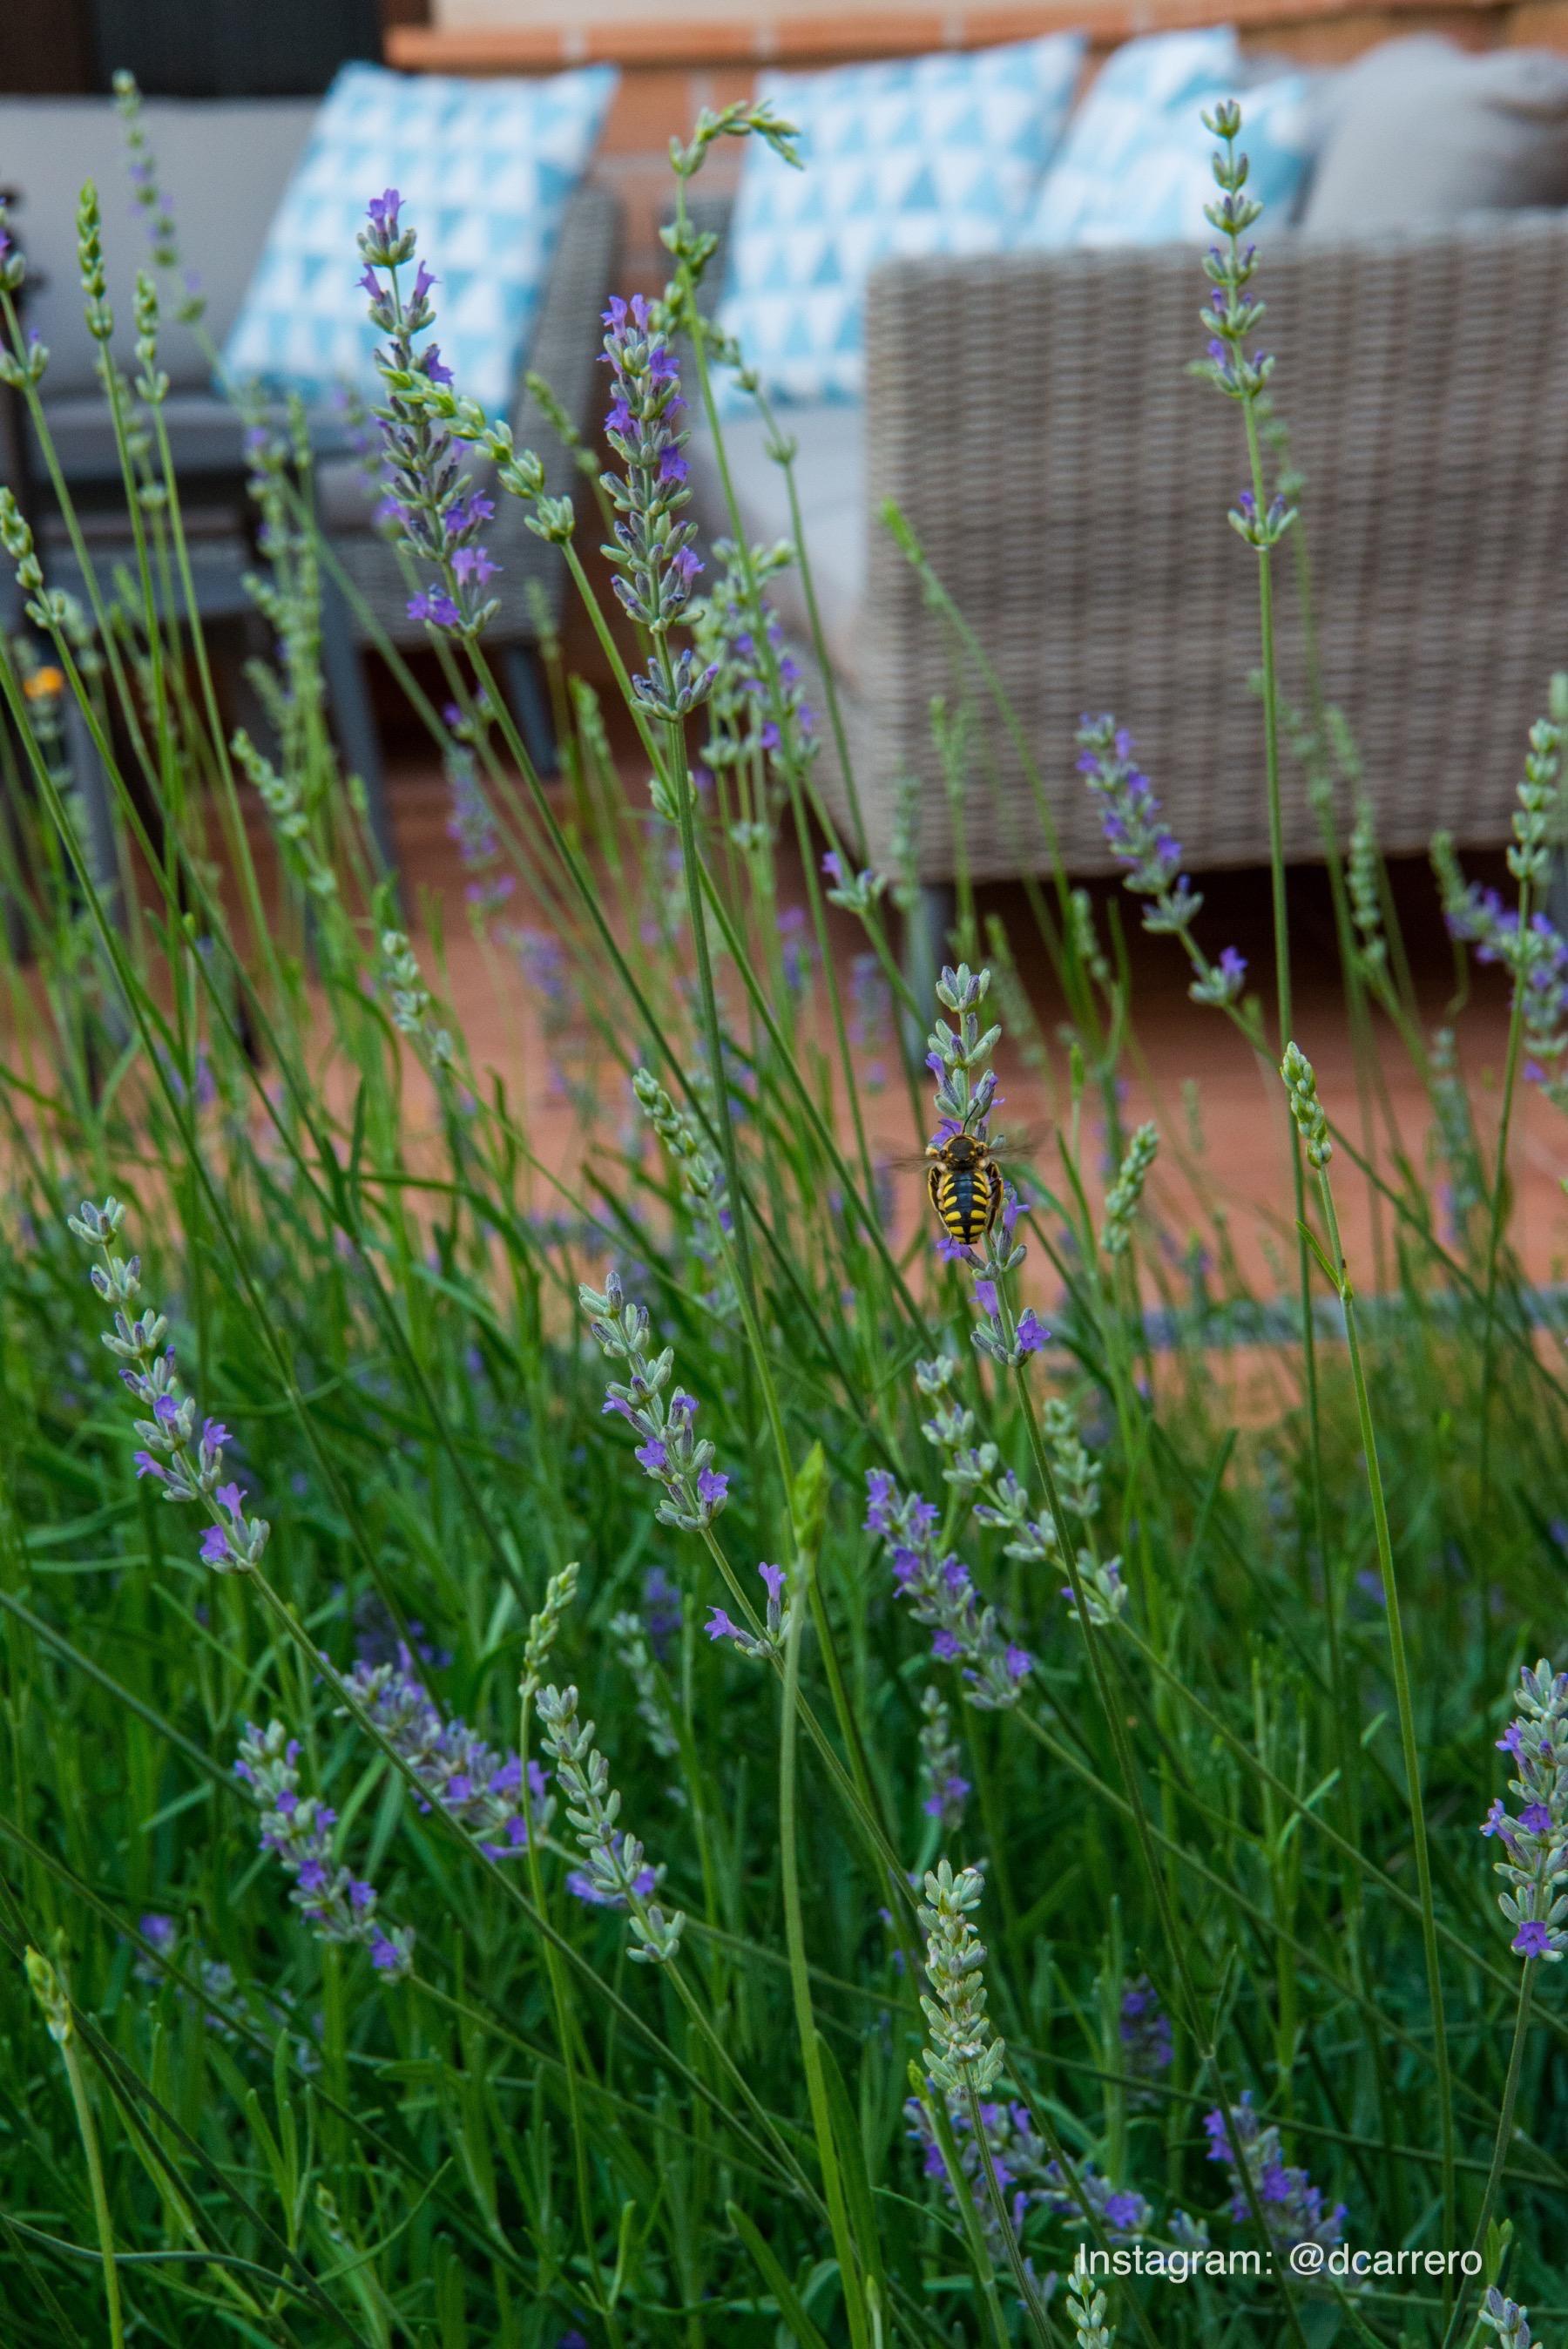 Abeja recogiendo polen en lavanda